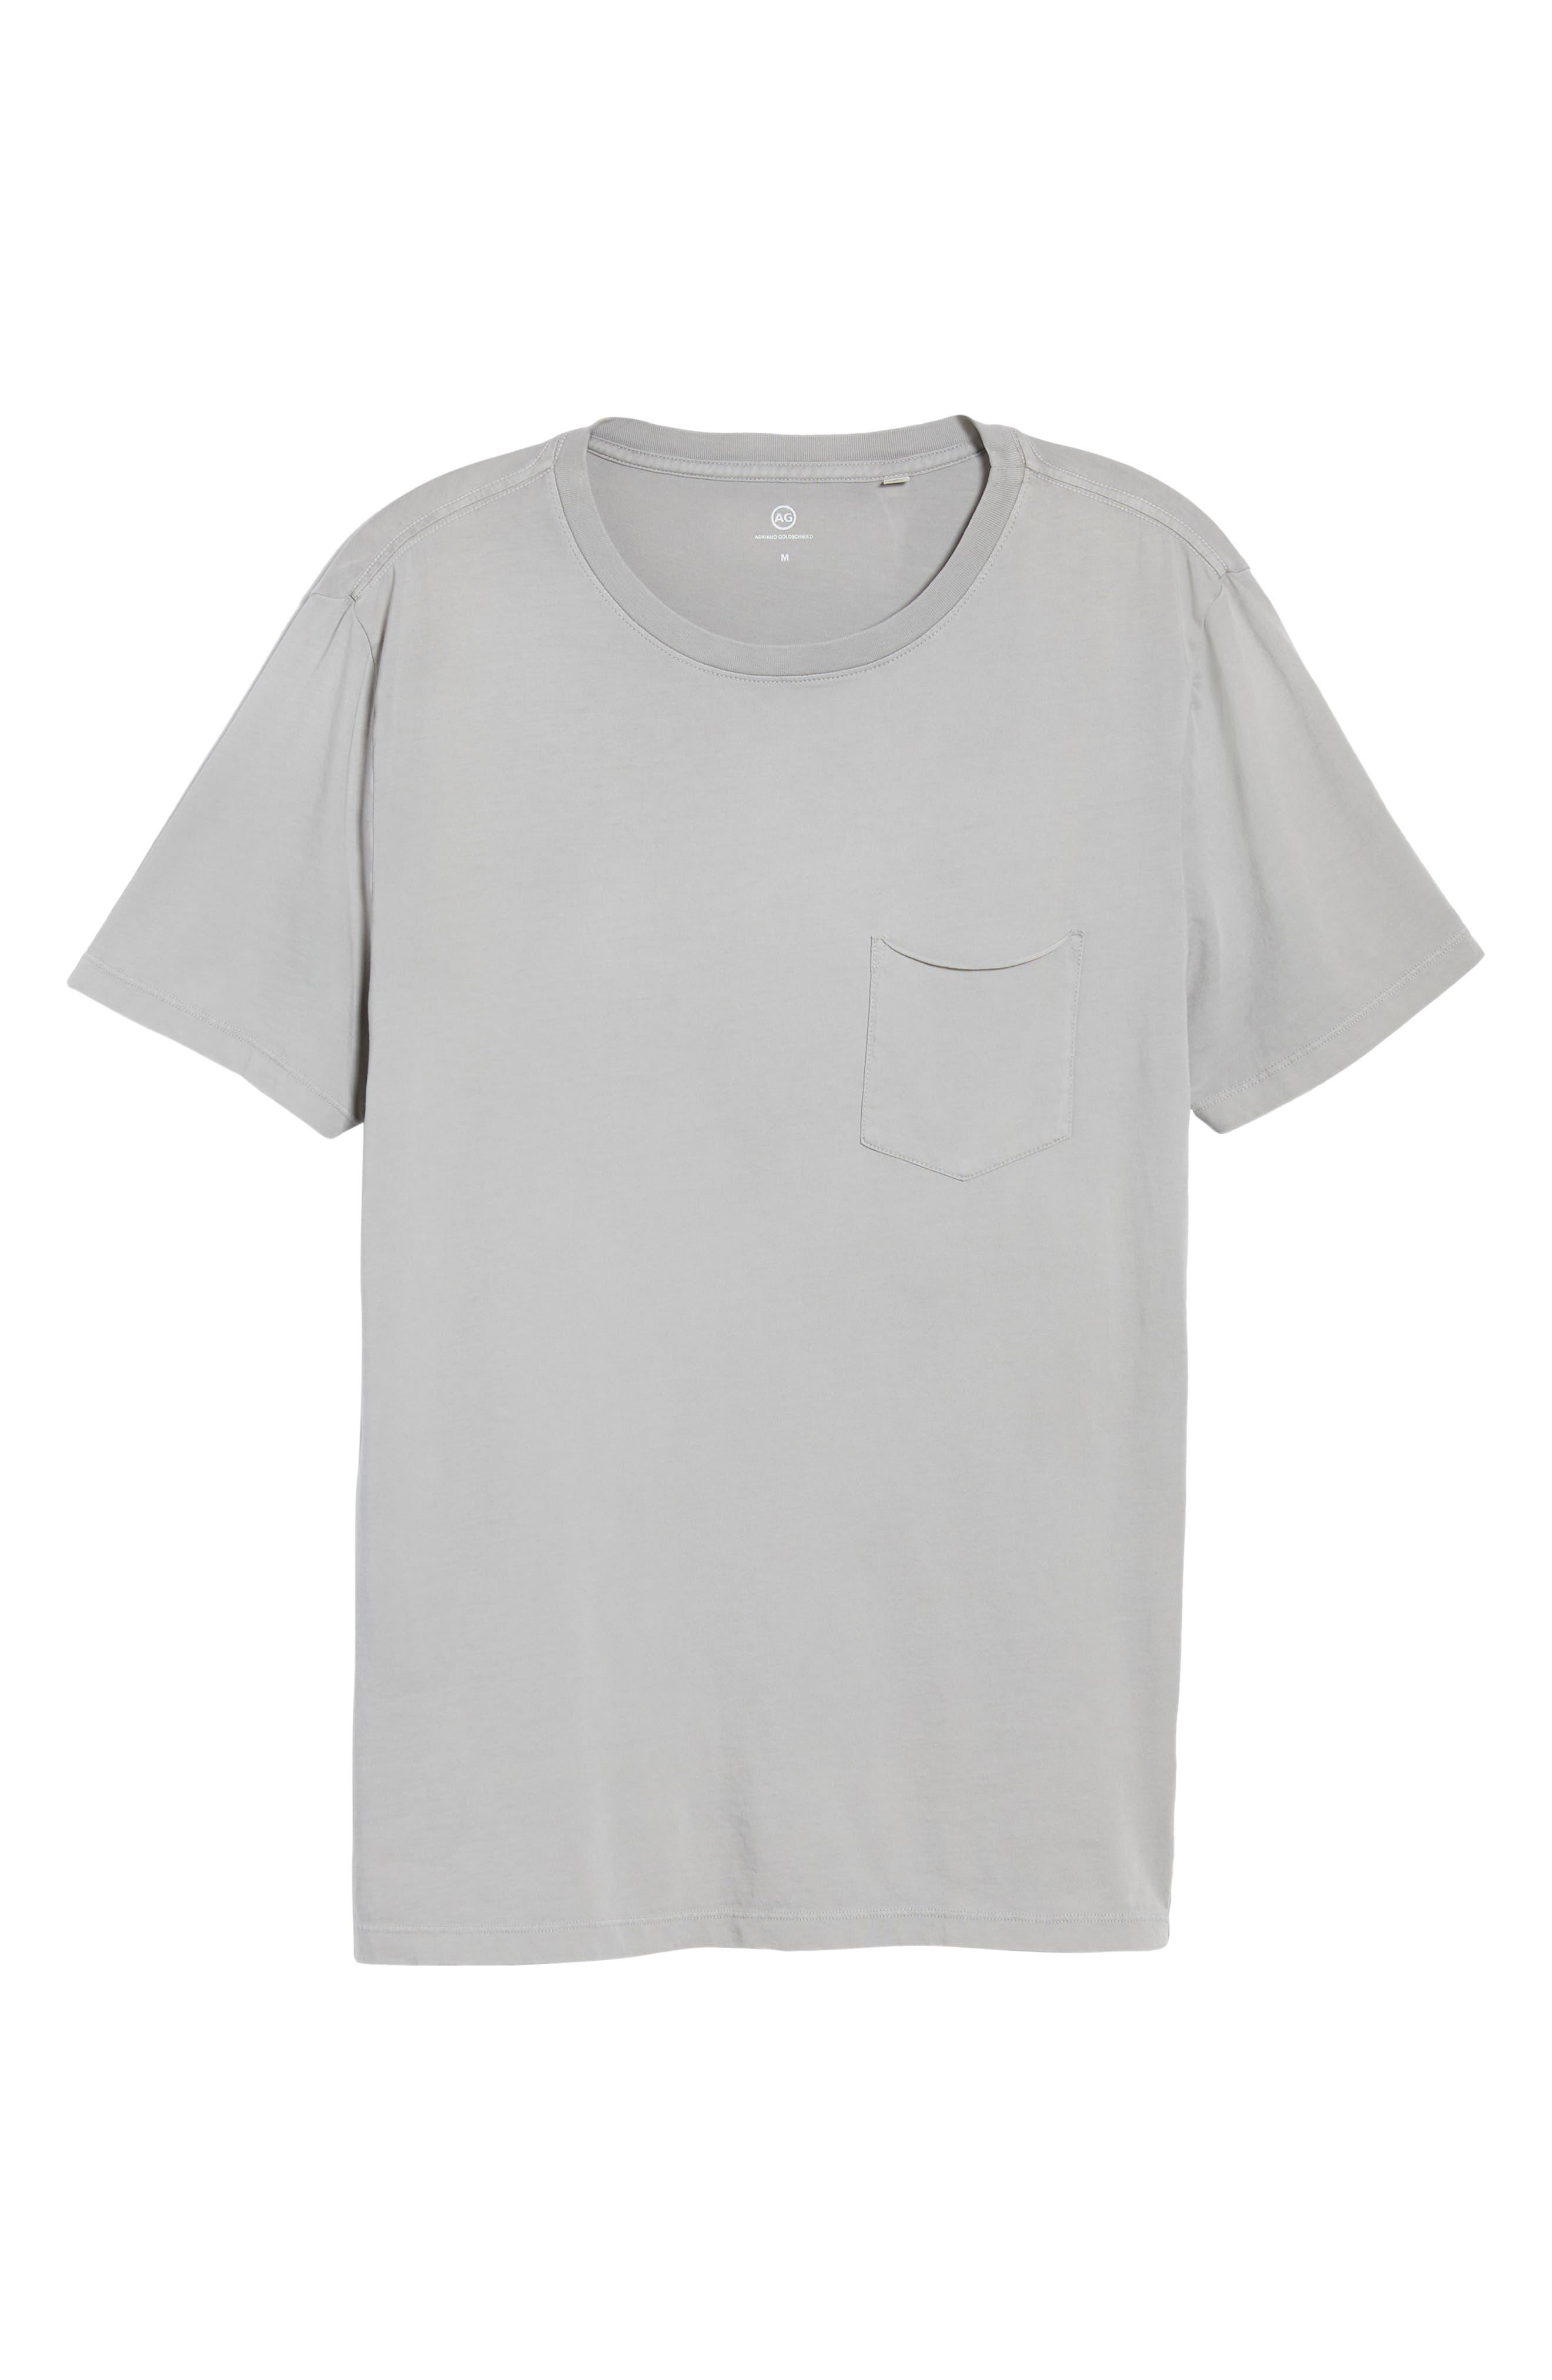 Anders Slim Fit Pocket T-Shirt,                             Alternate thumbnail 6, color,                             SUN FADED PEBBLE BEACH